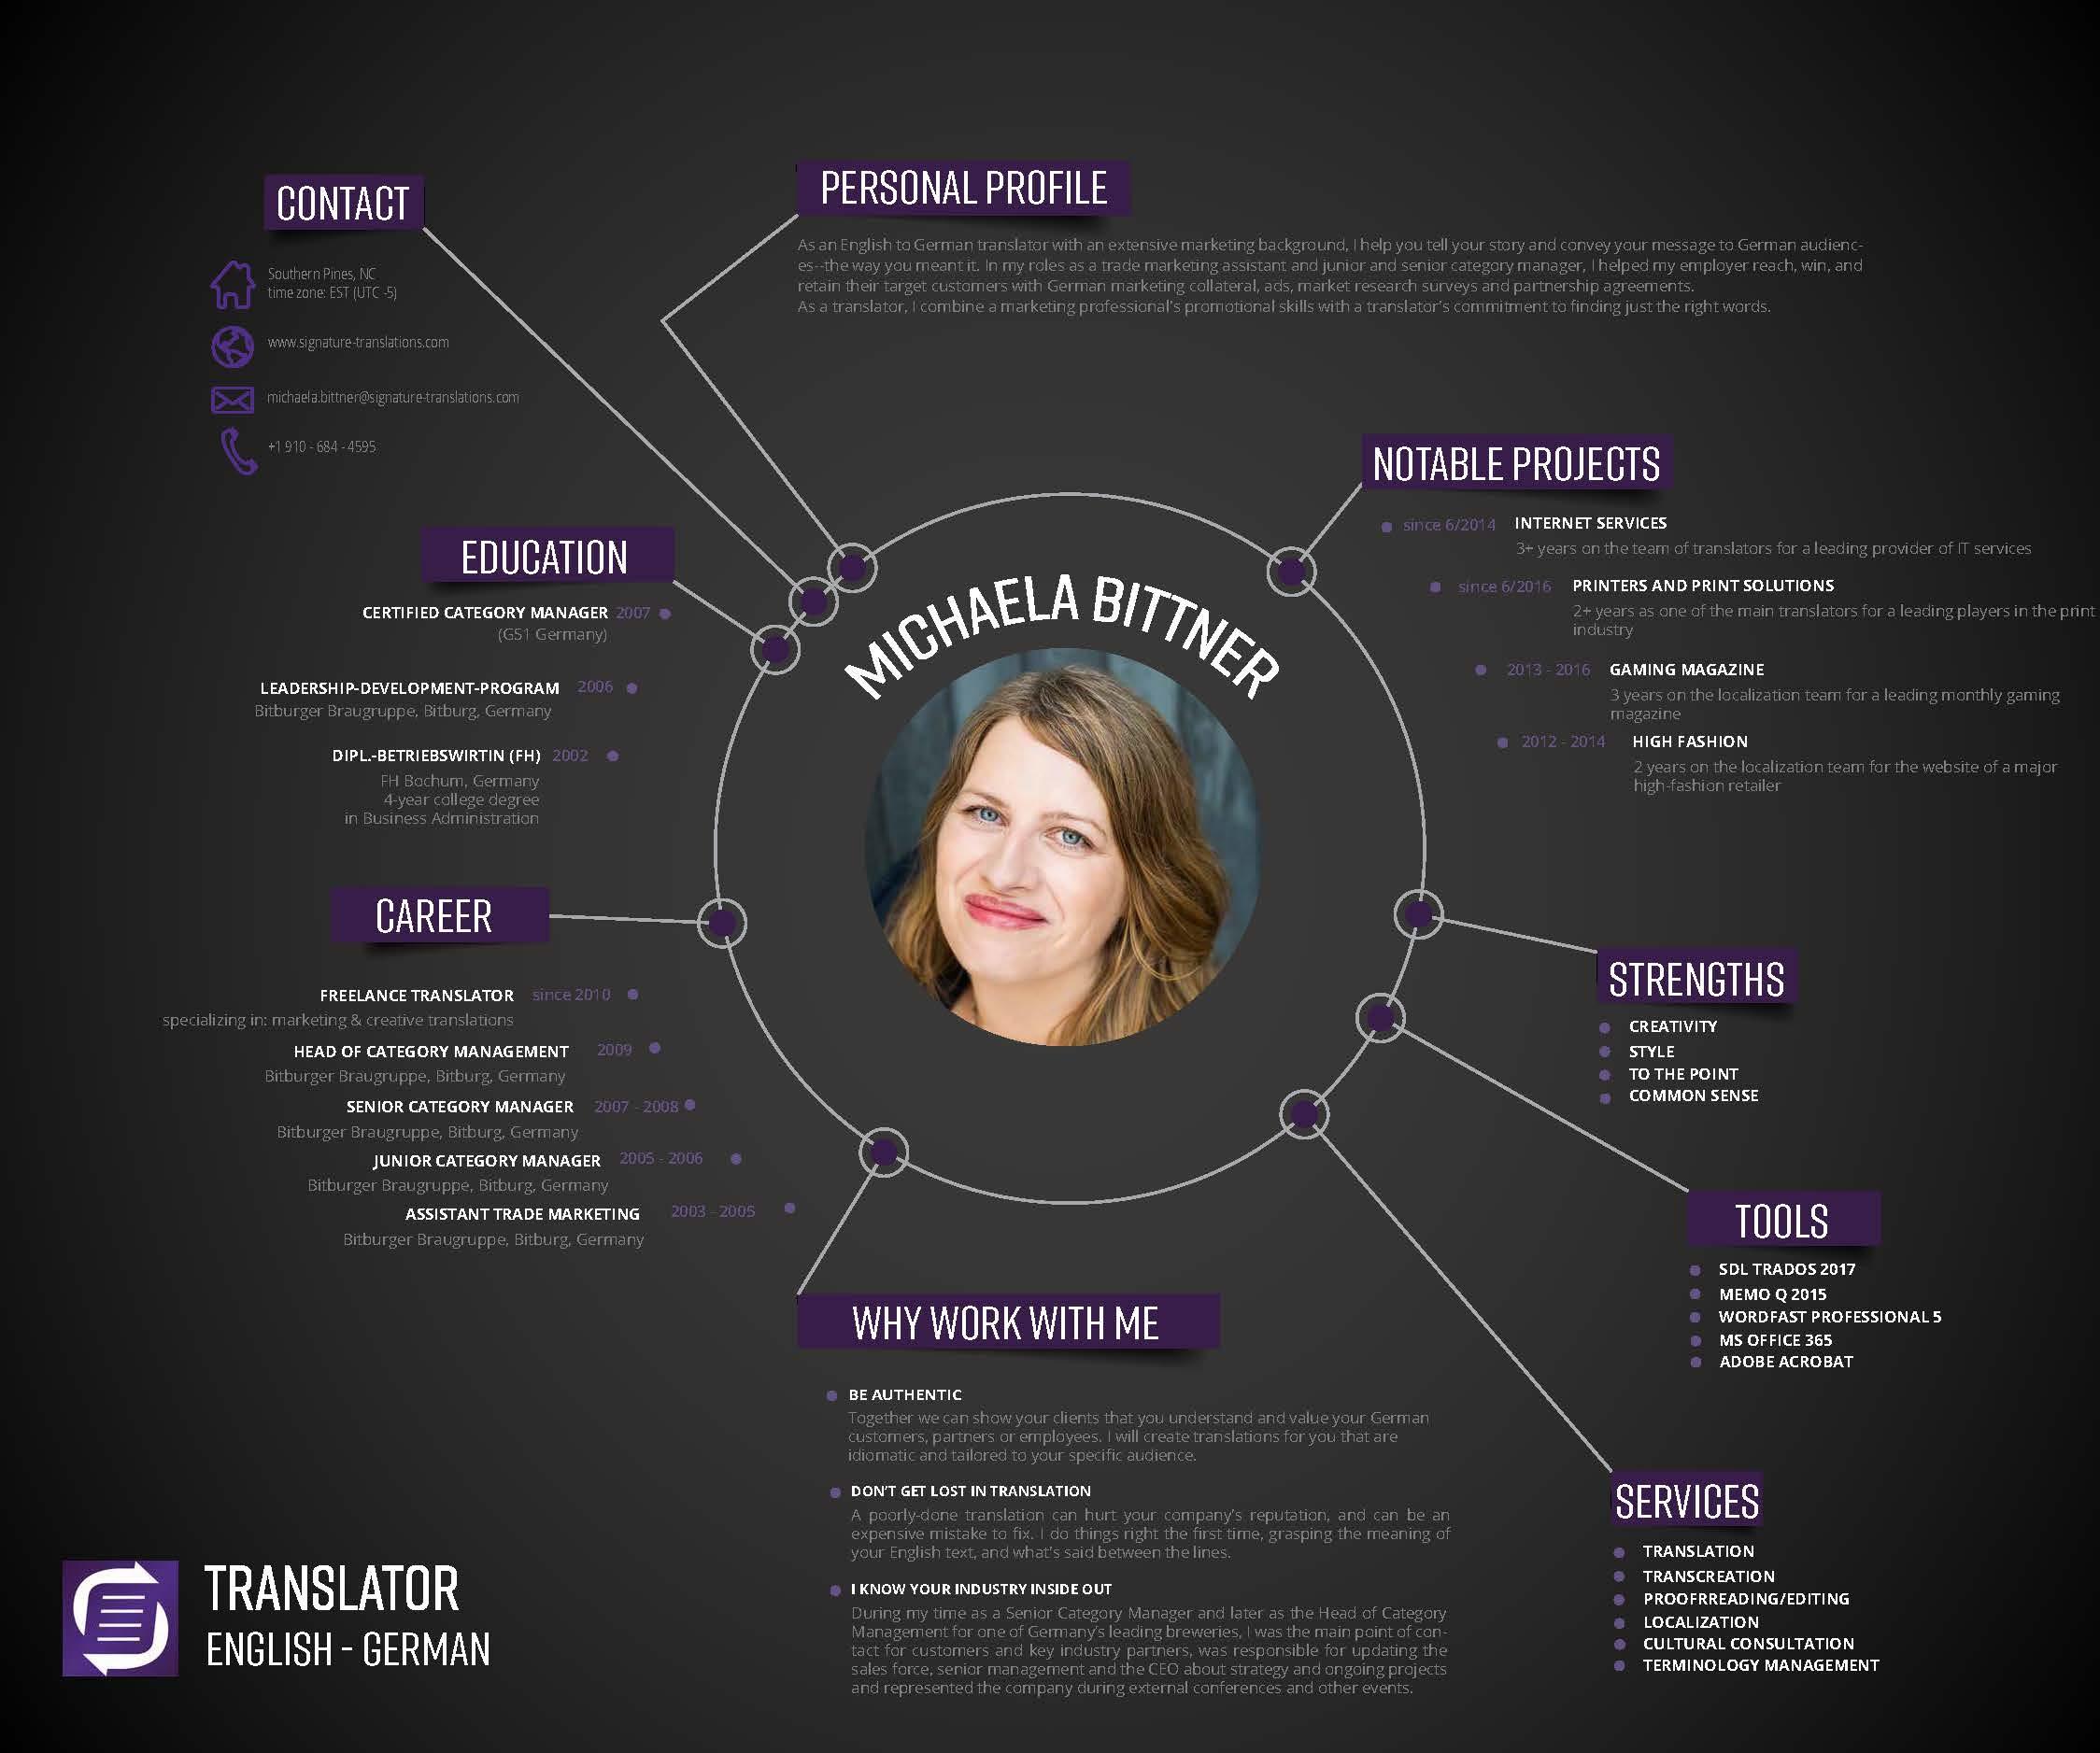 Freelance Translator English German Specializing In Marketing Creative Translations